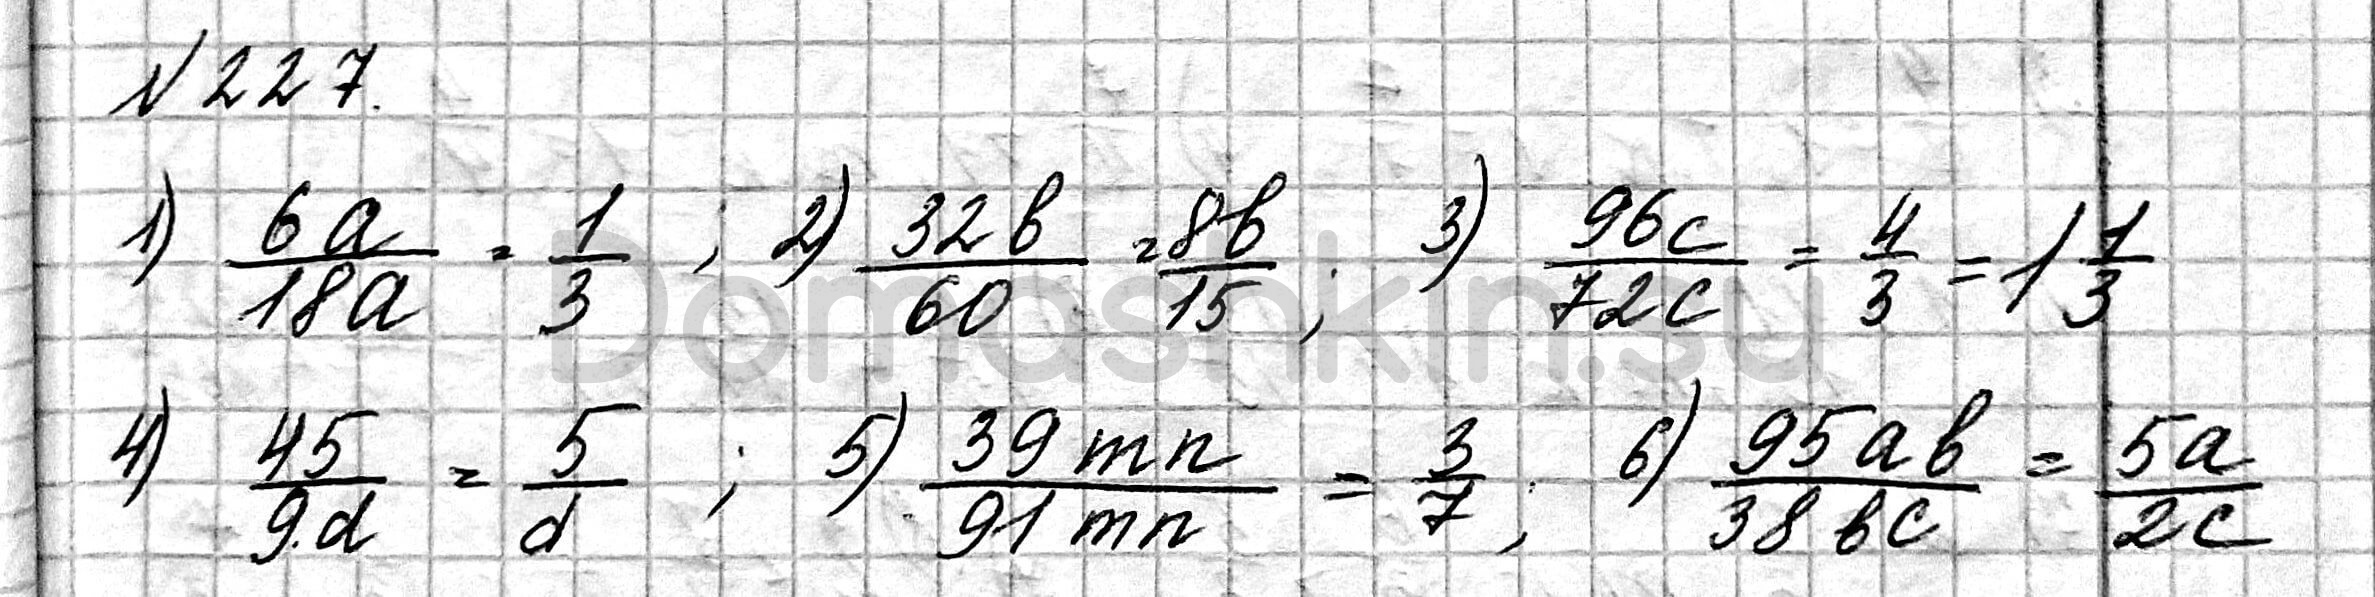 Математика 6 класс учебник Мерзляк номер 227 решение